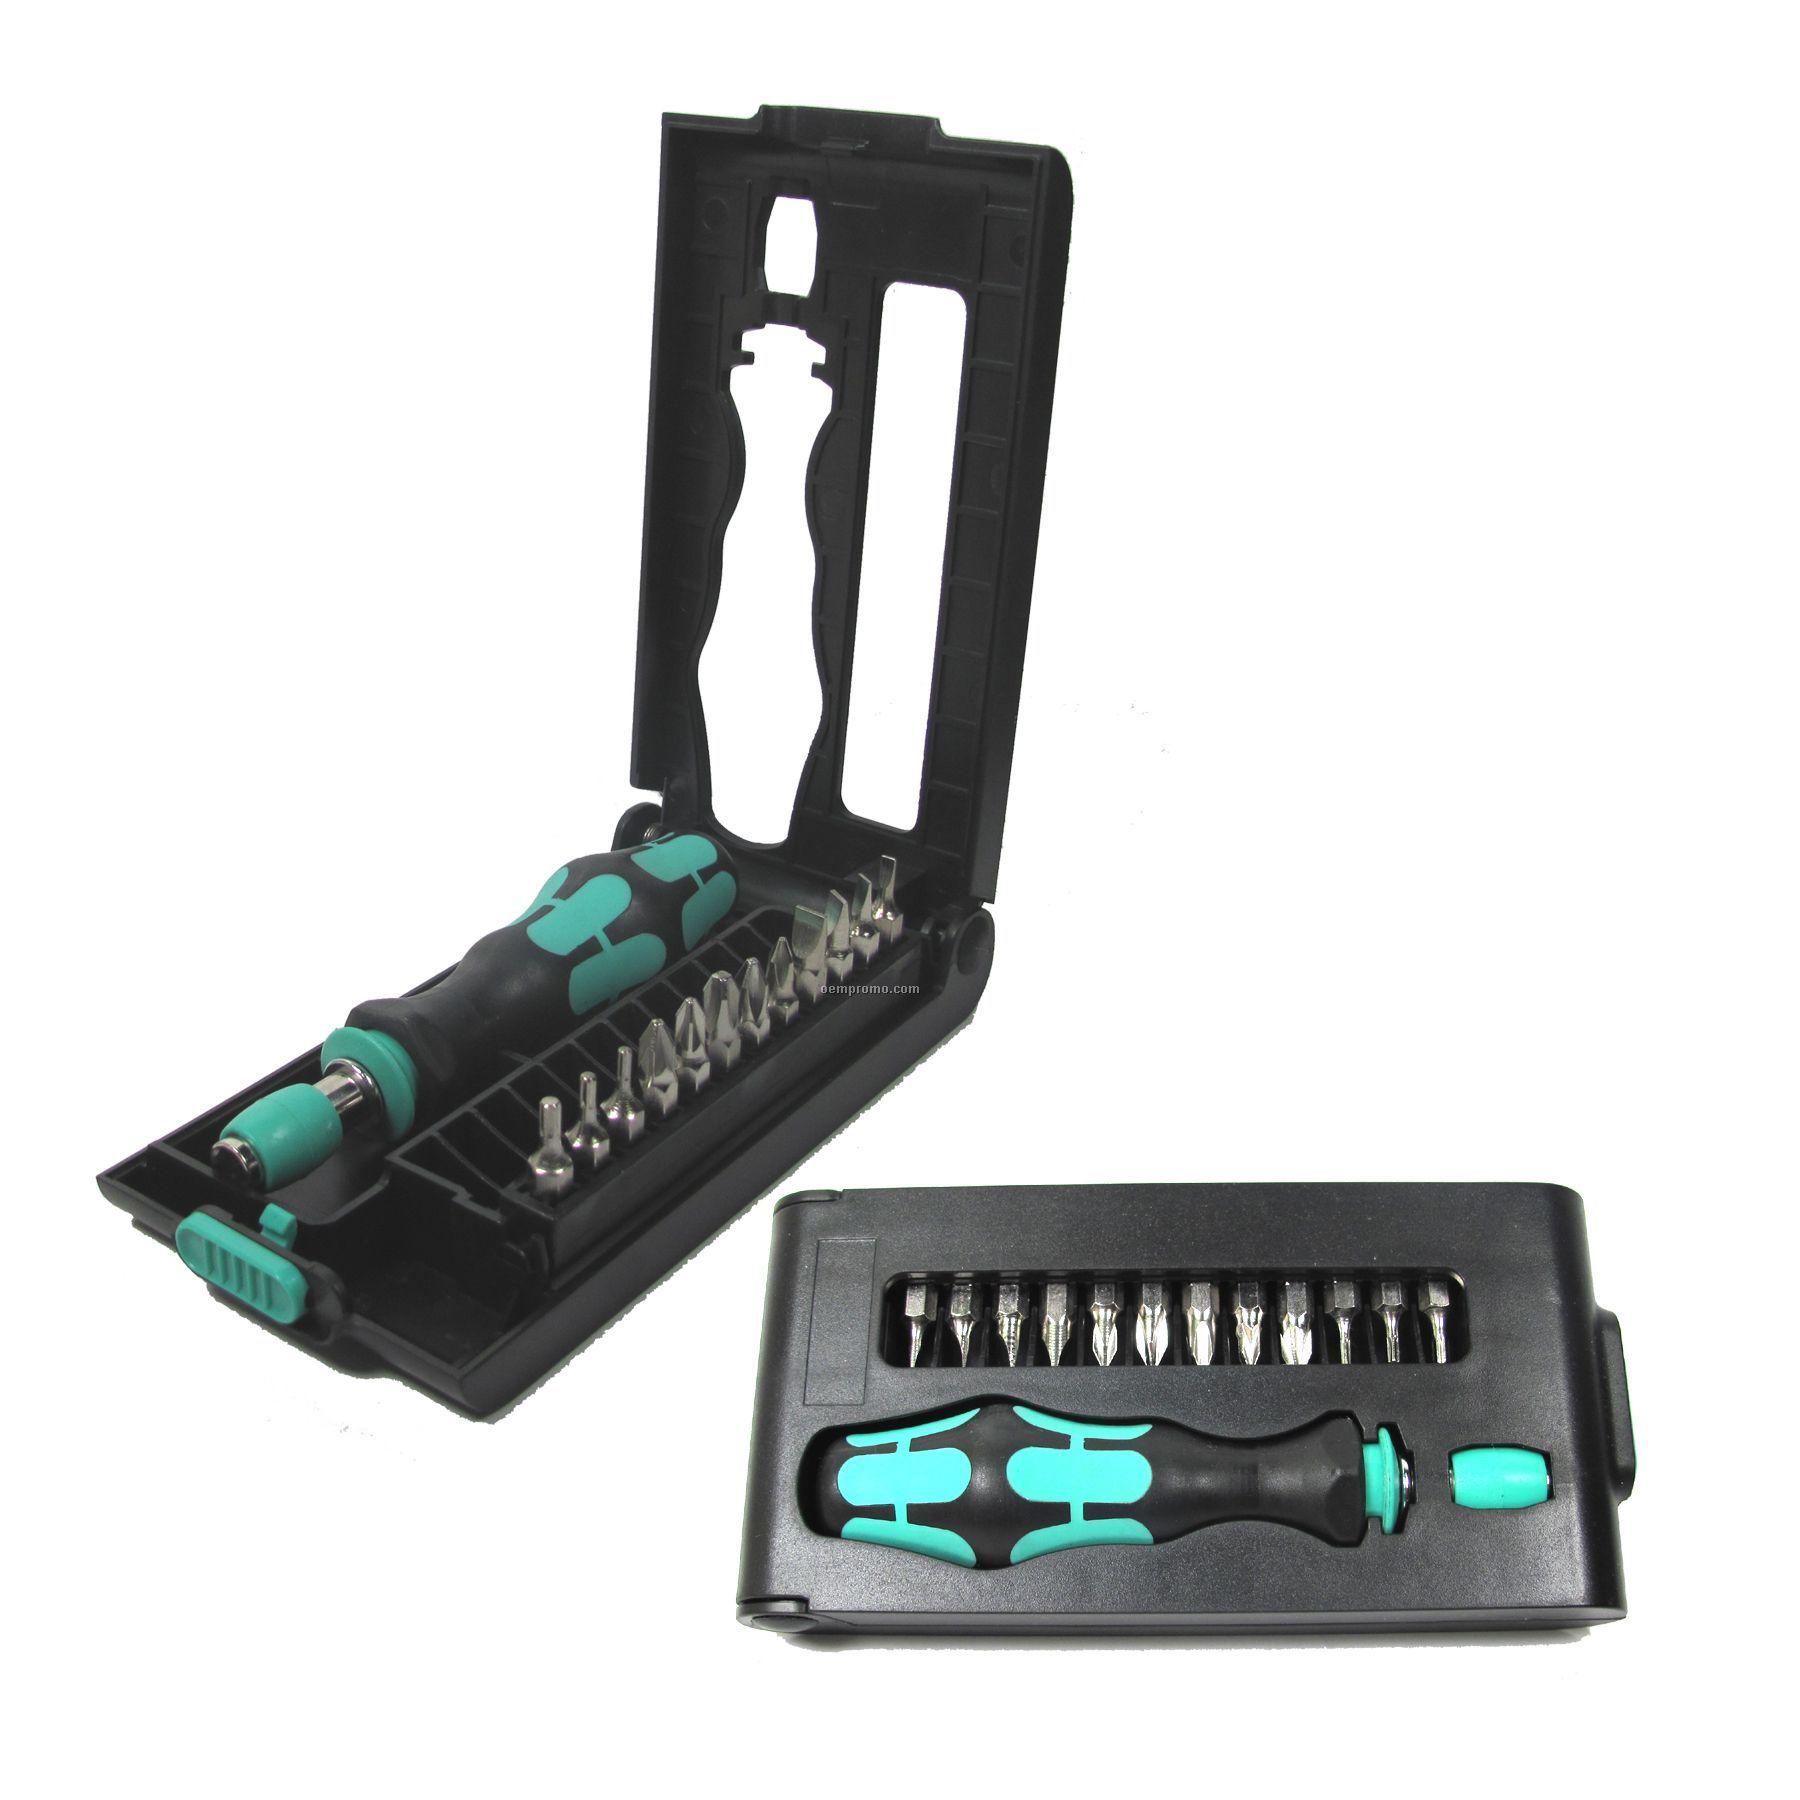 kits tool china wholesale kits tool page 21. Black Bedroom Furniture Sets. Home Design Ideas